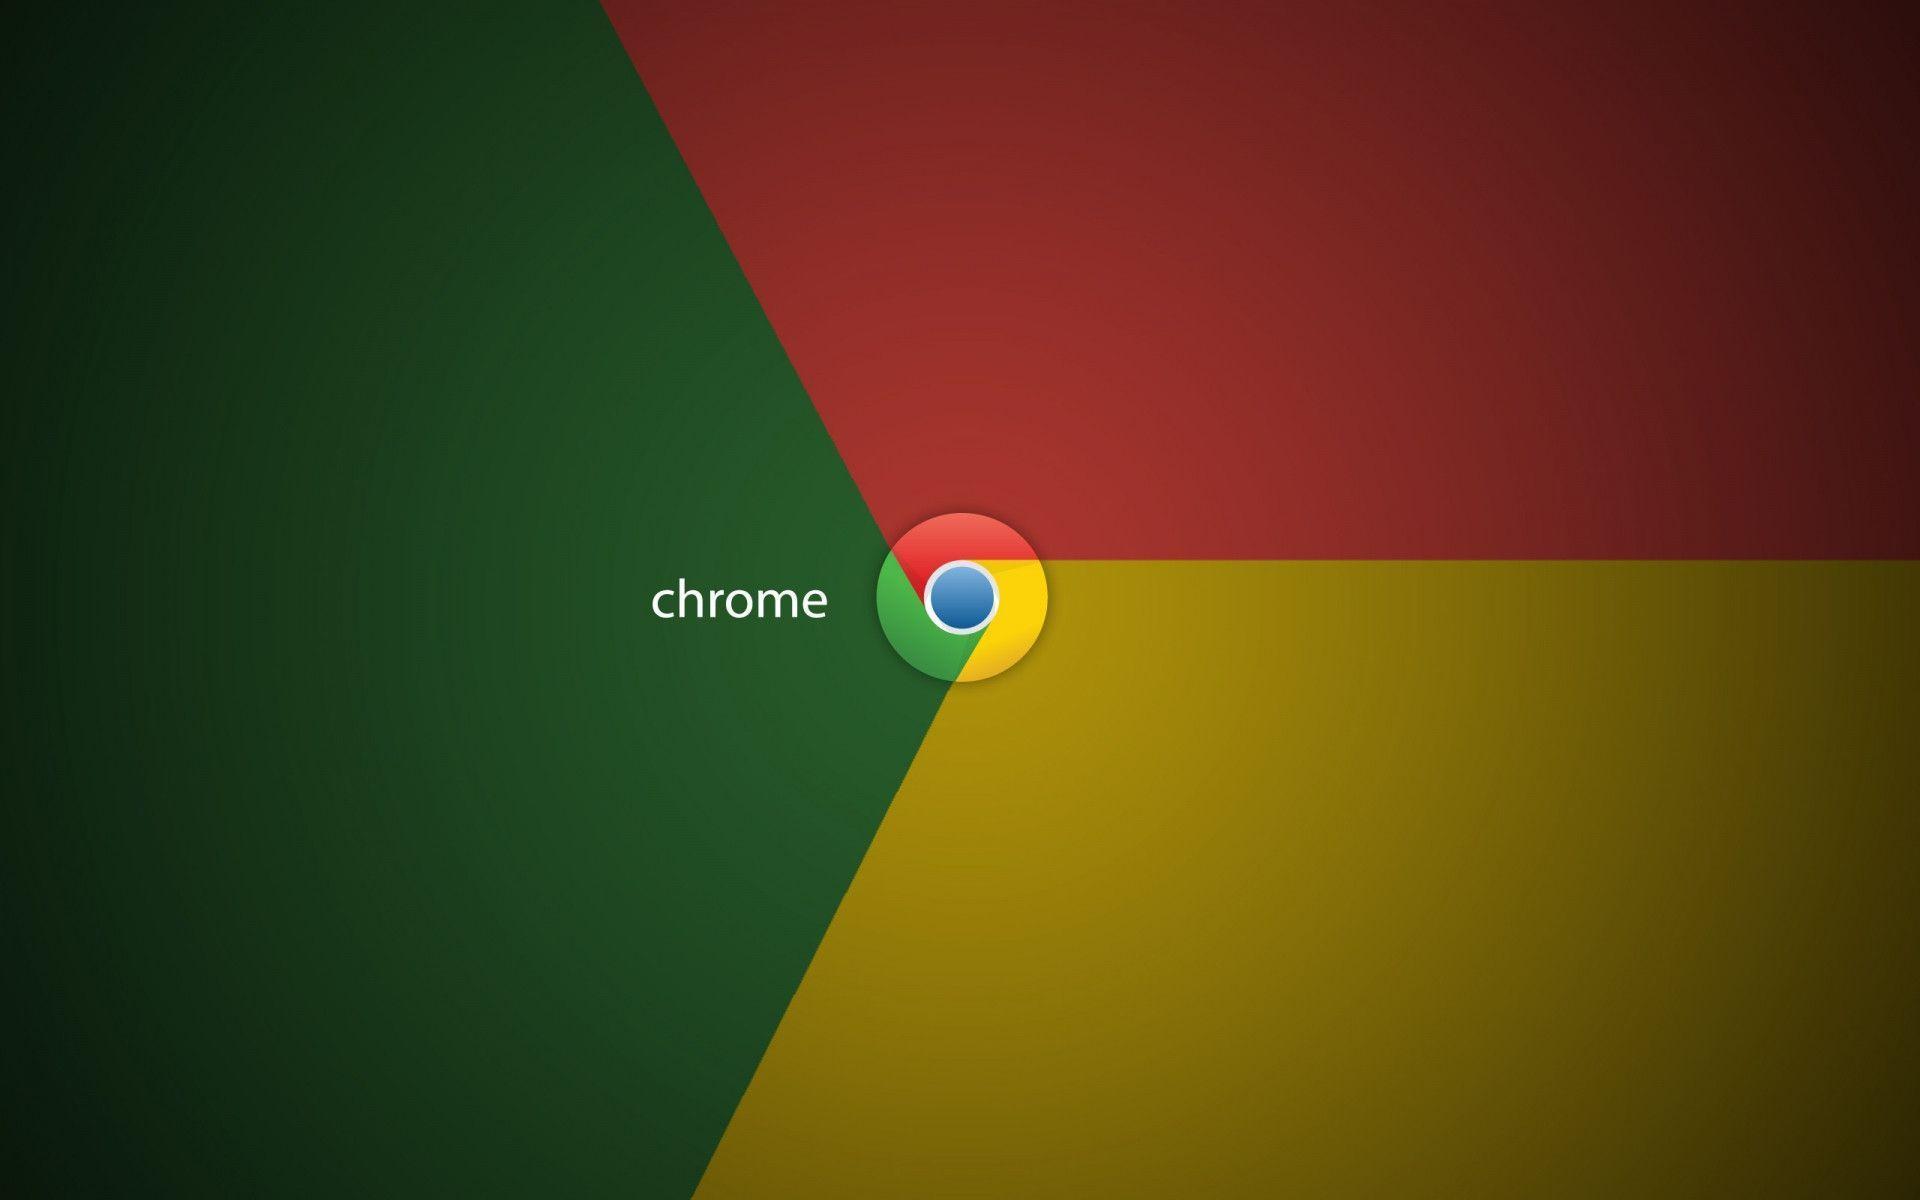 Google themes windows 7 free download - Google Logo Hd Wallpaper Wallpaper Download